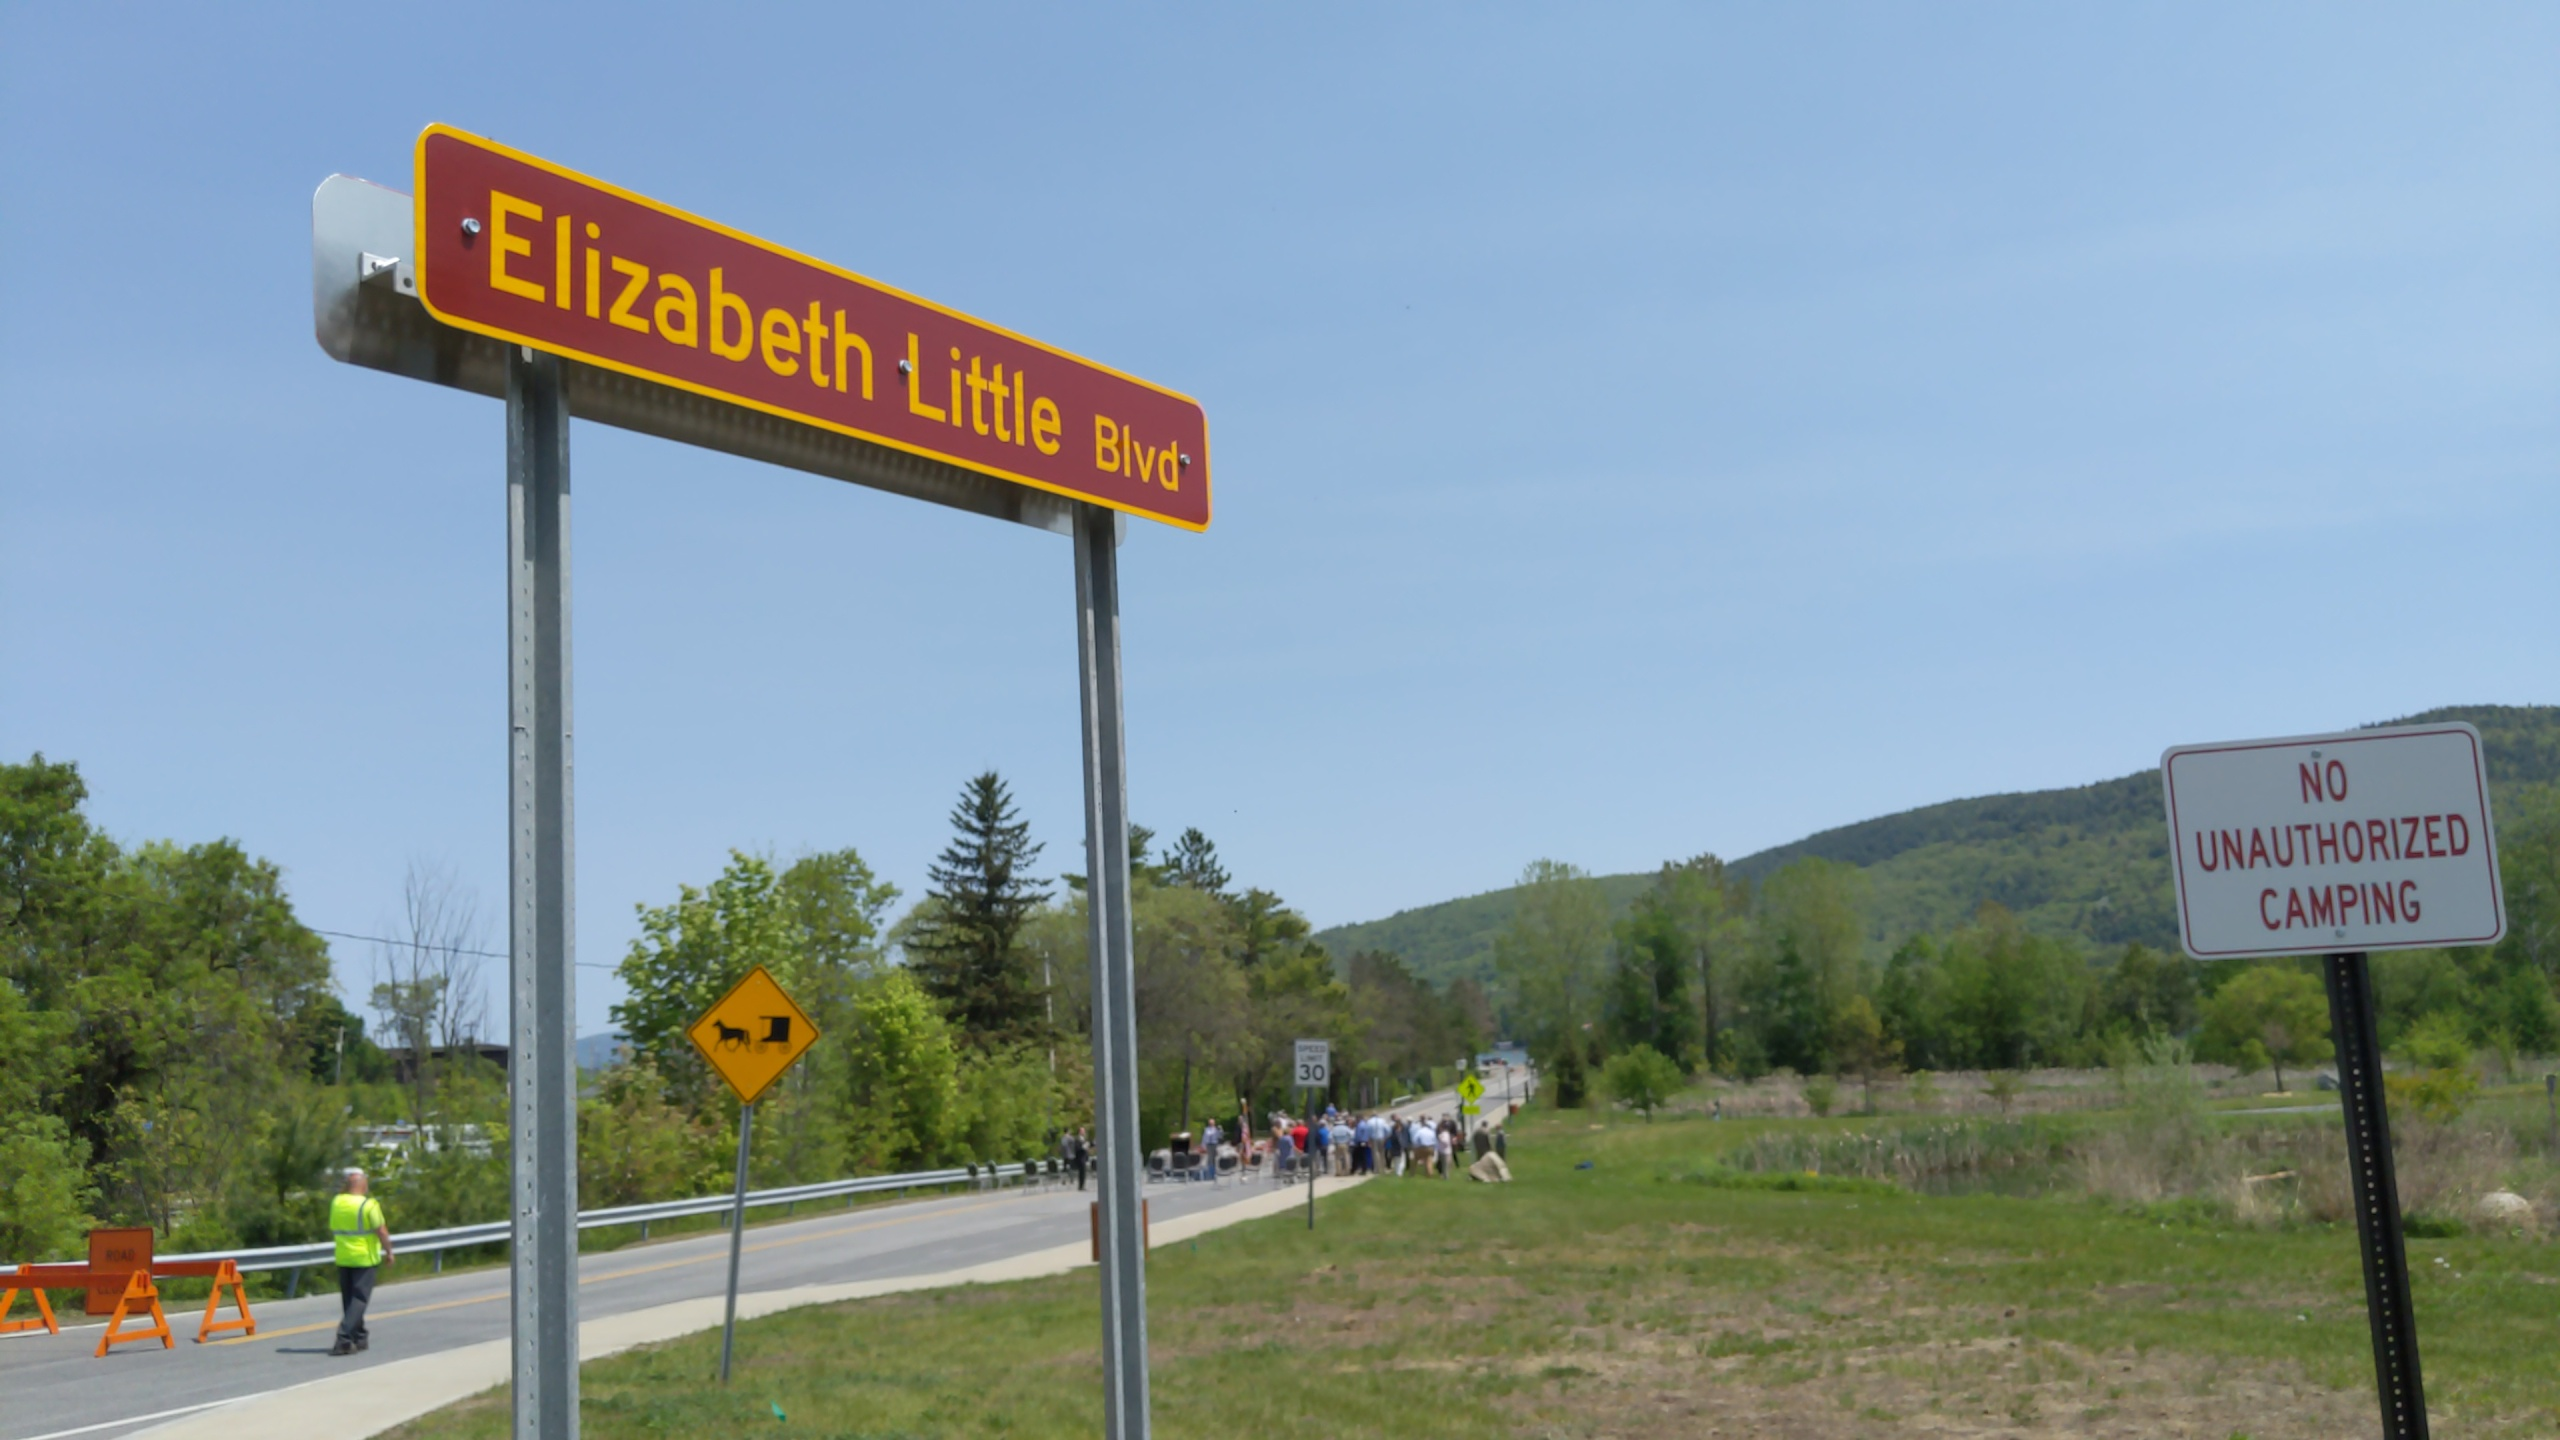 lake george betty elizabeth little boulevard